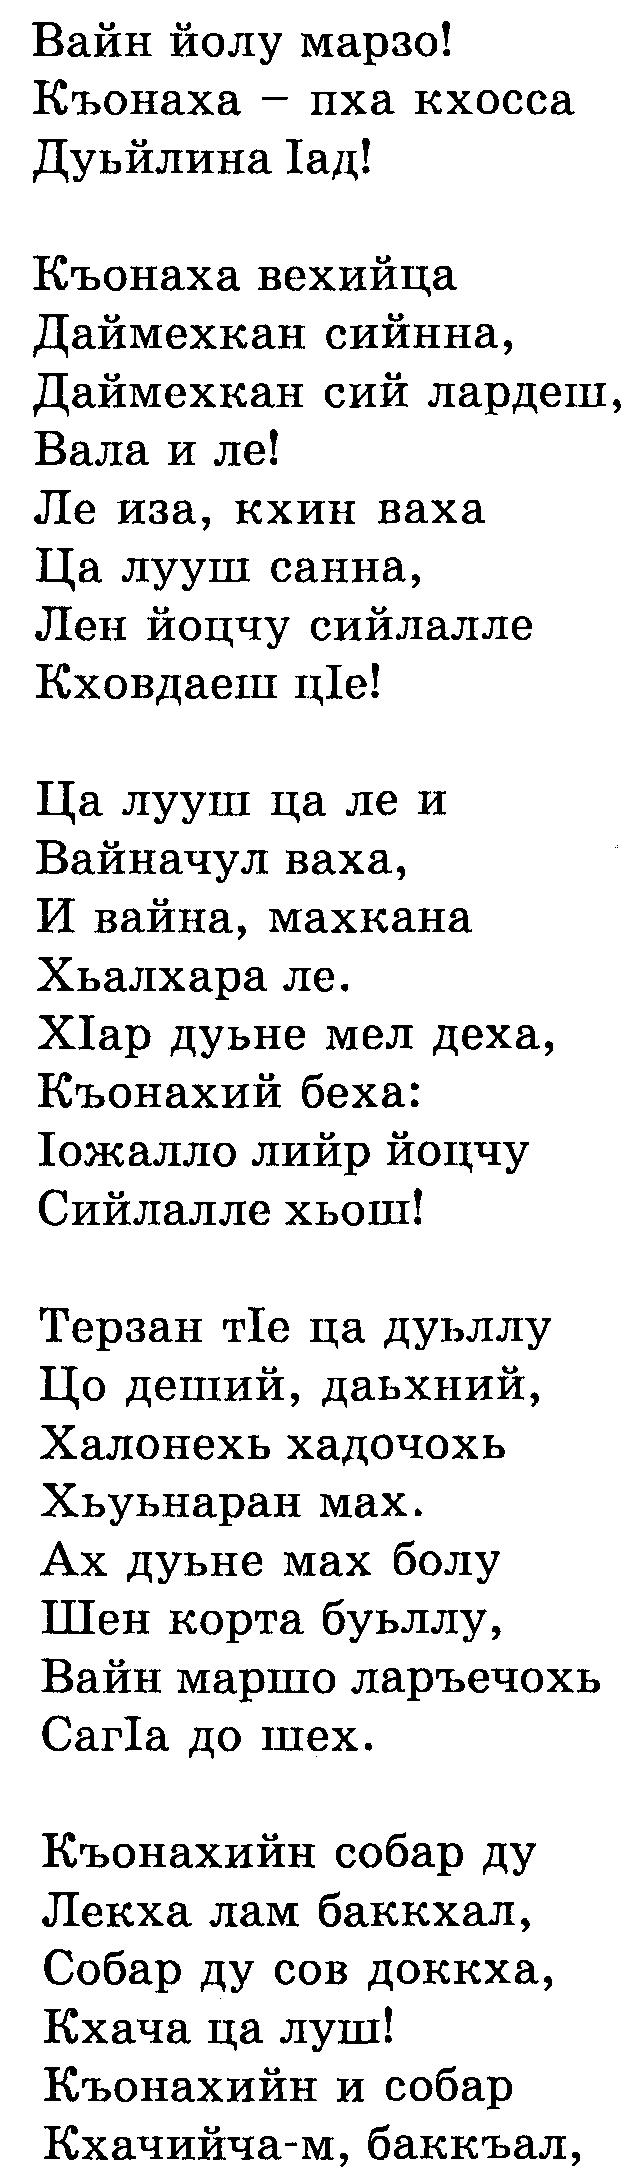 C:\Documents and Settings\Admin\Рабочий стол\С0002.tif